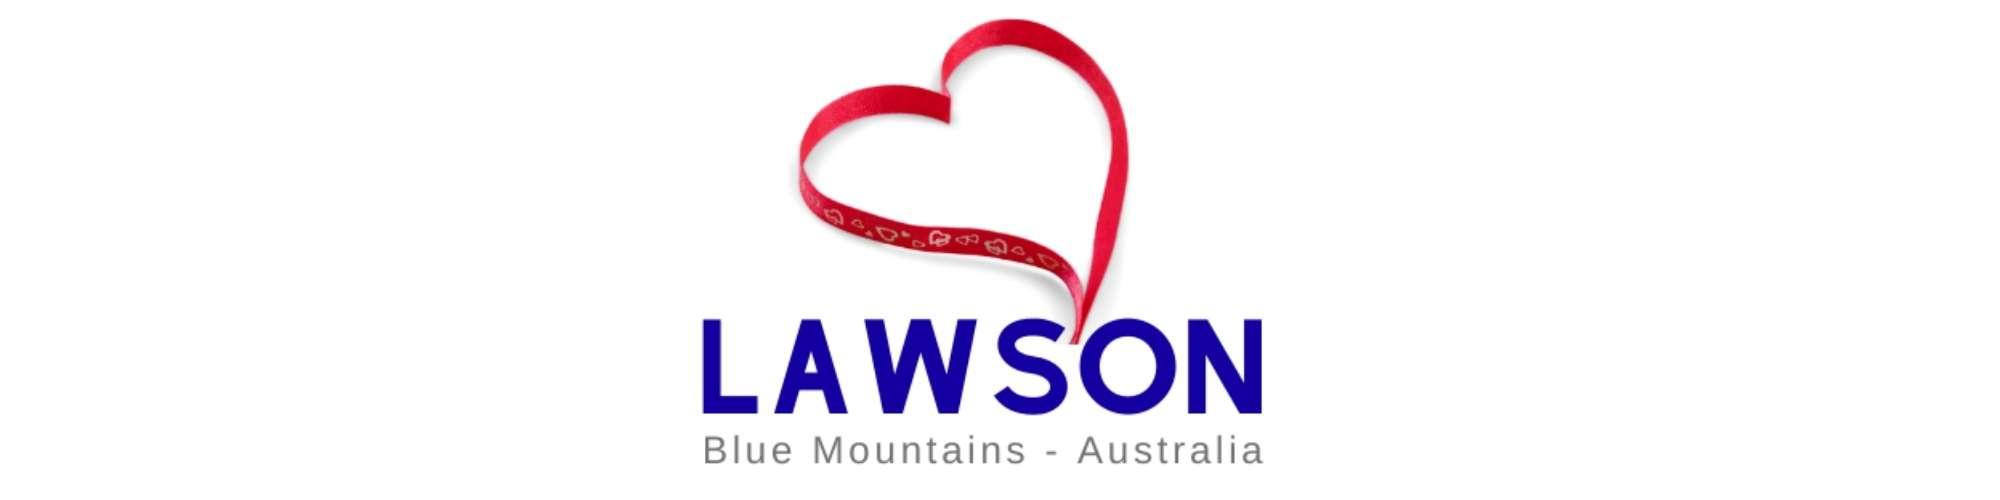 Lawson Visitor